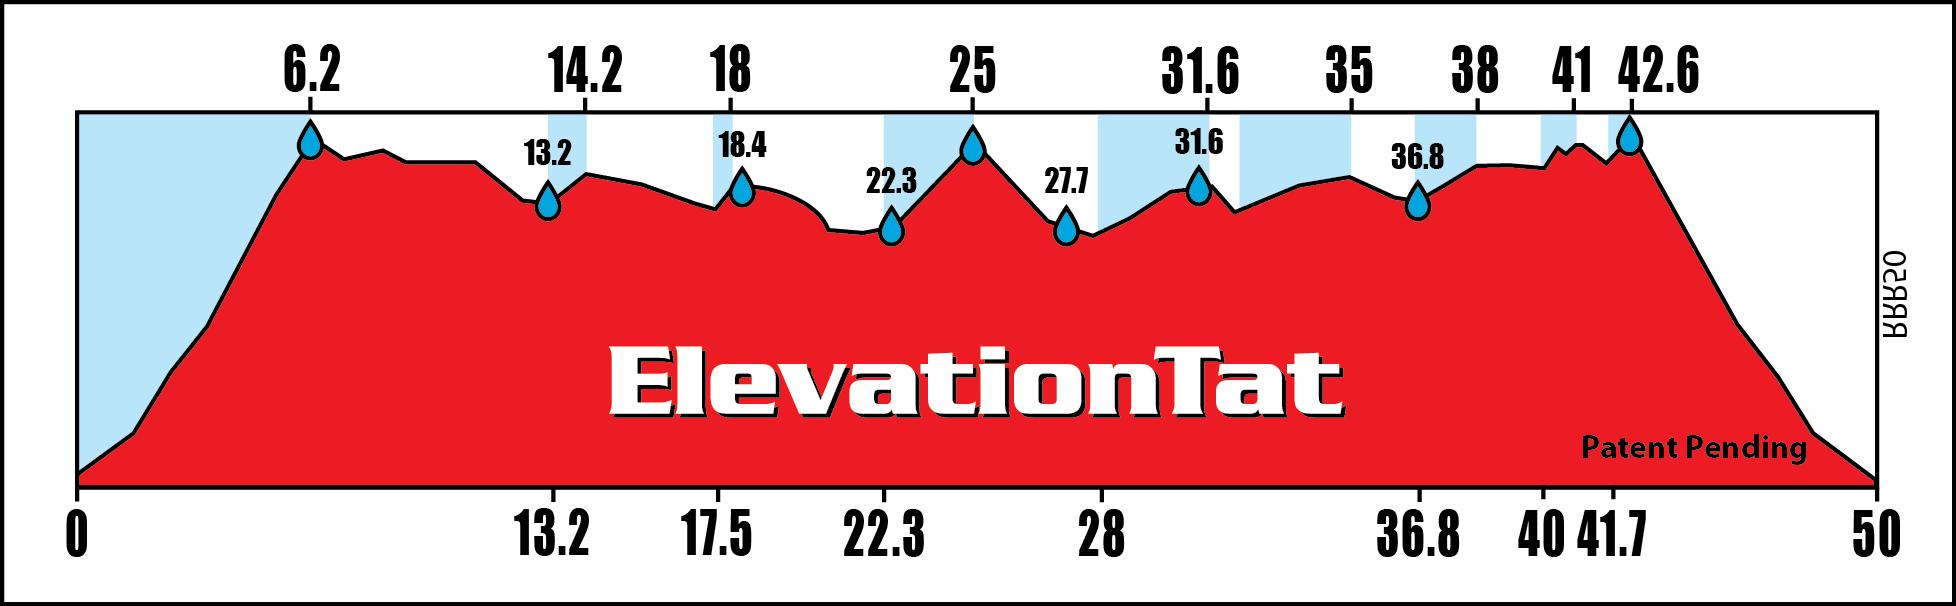 50 Elevation